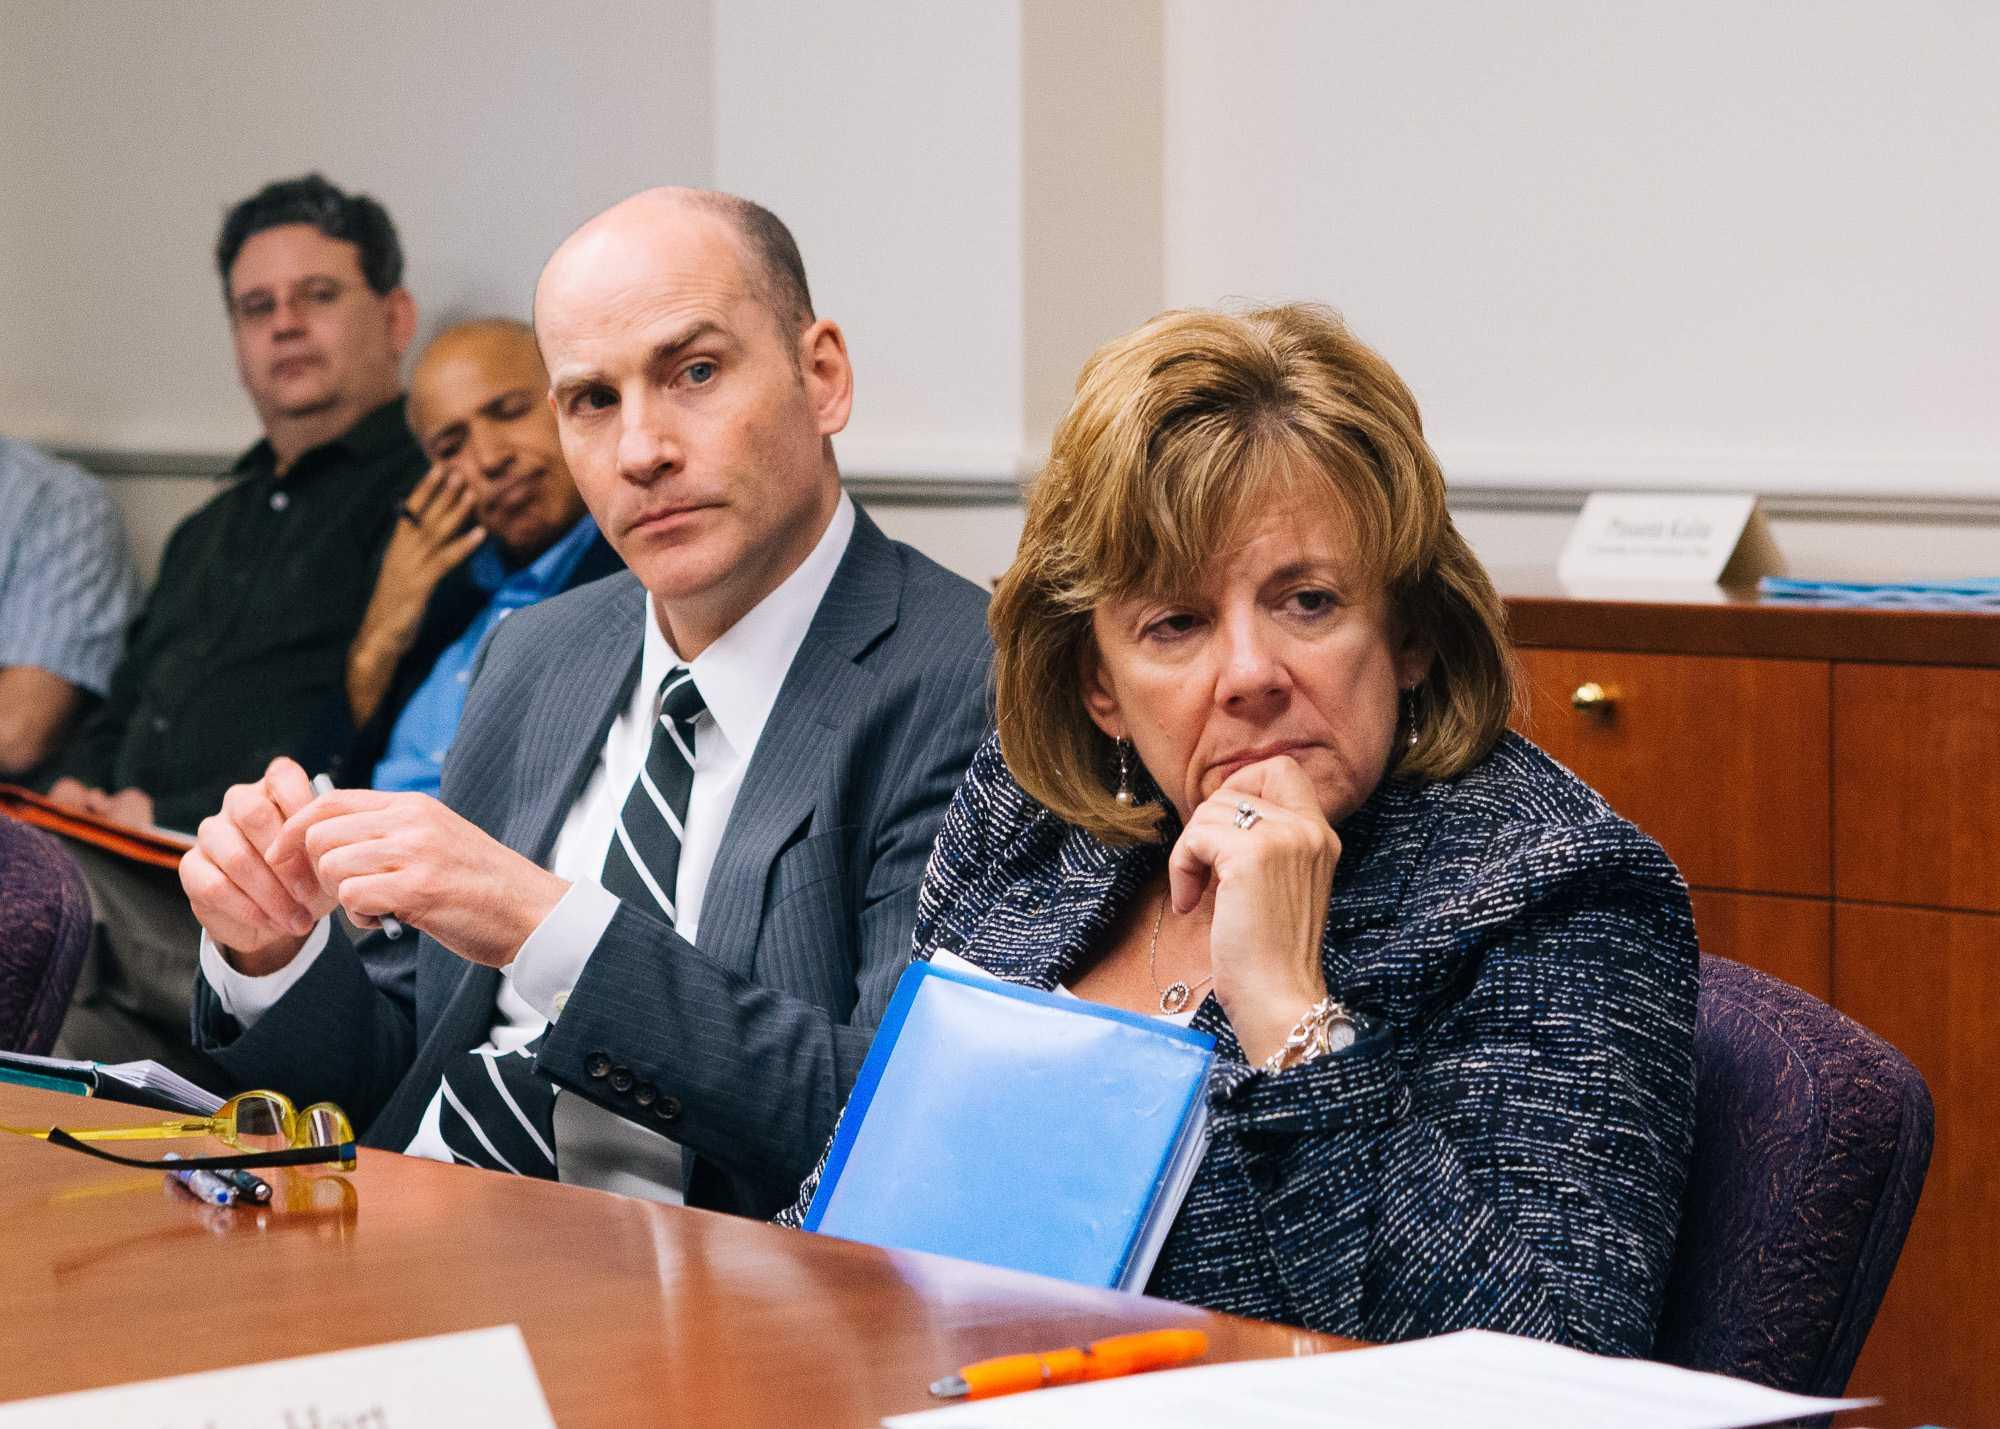 Interim Vice Chancellor Edward Feser and Interim Chancellor Barbara Wilson listen during the SEC meeting in Urbana, IL on Monday, April 25.